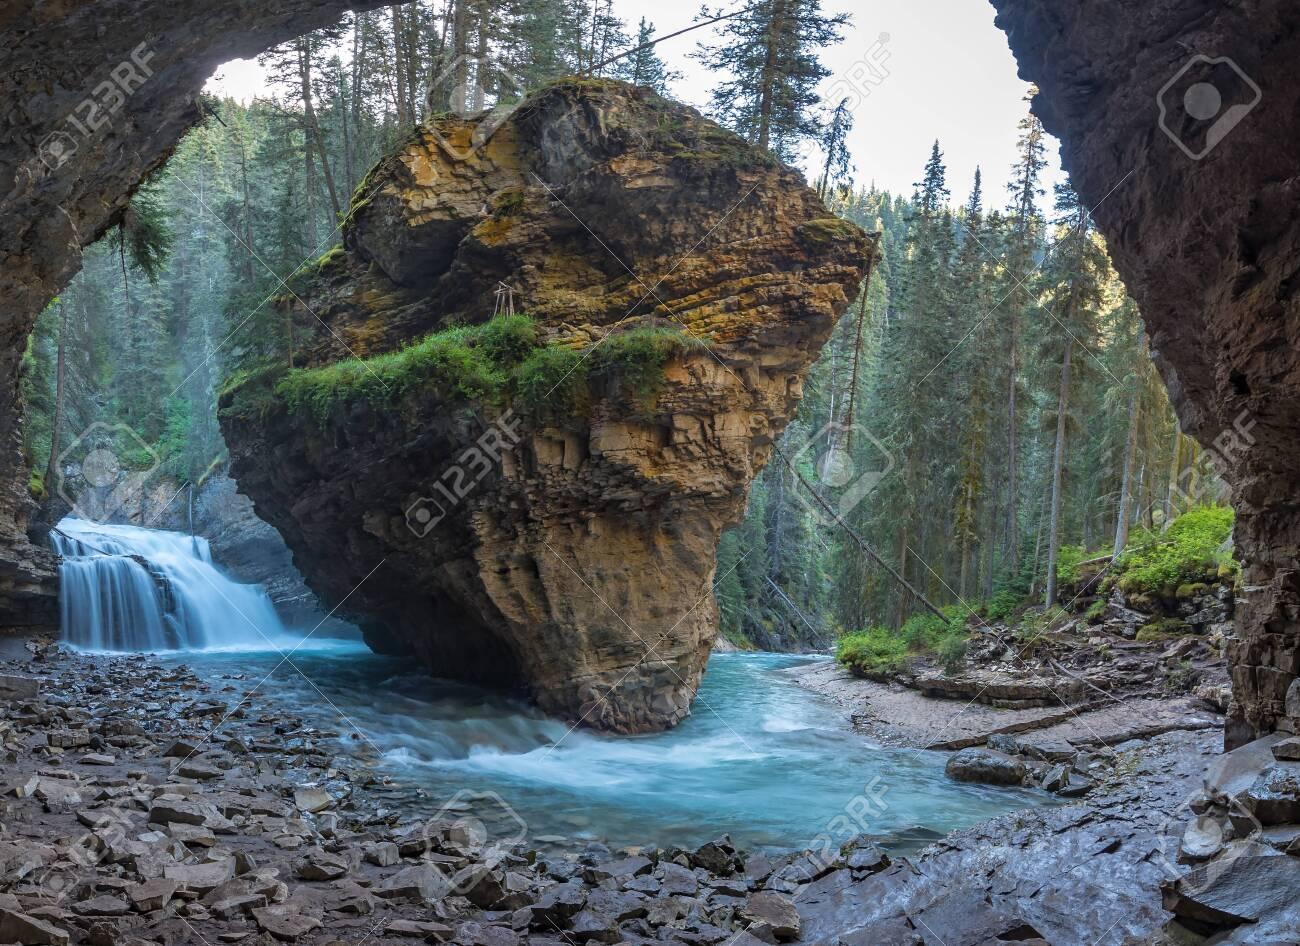 Johnston Canyon cave in Spring season with waterfalls, Johnston Canyon Trail, Alberta, Canada. - 115503224